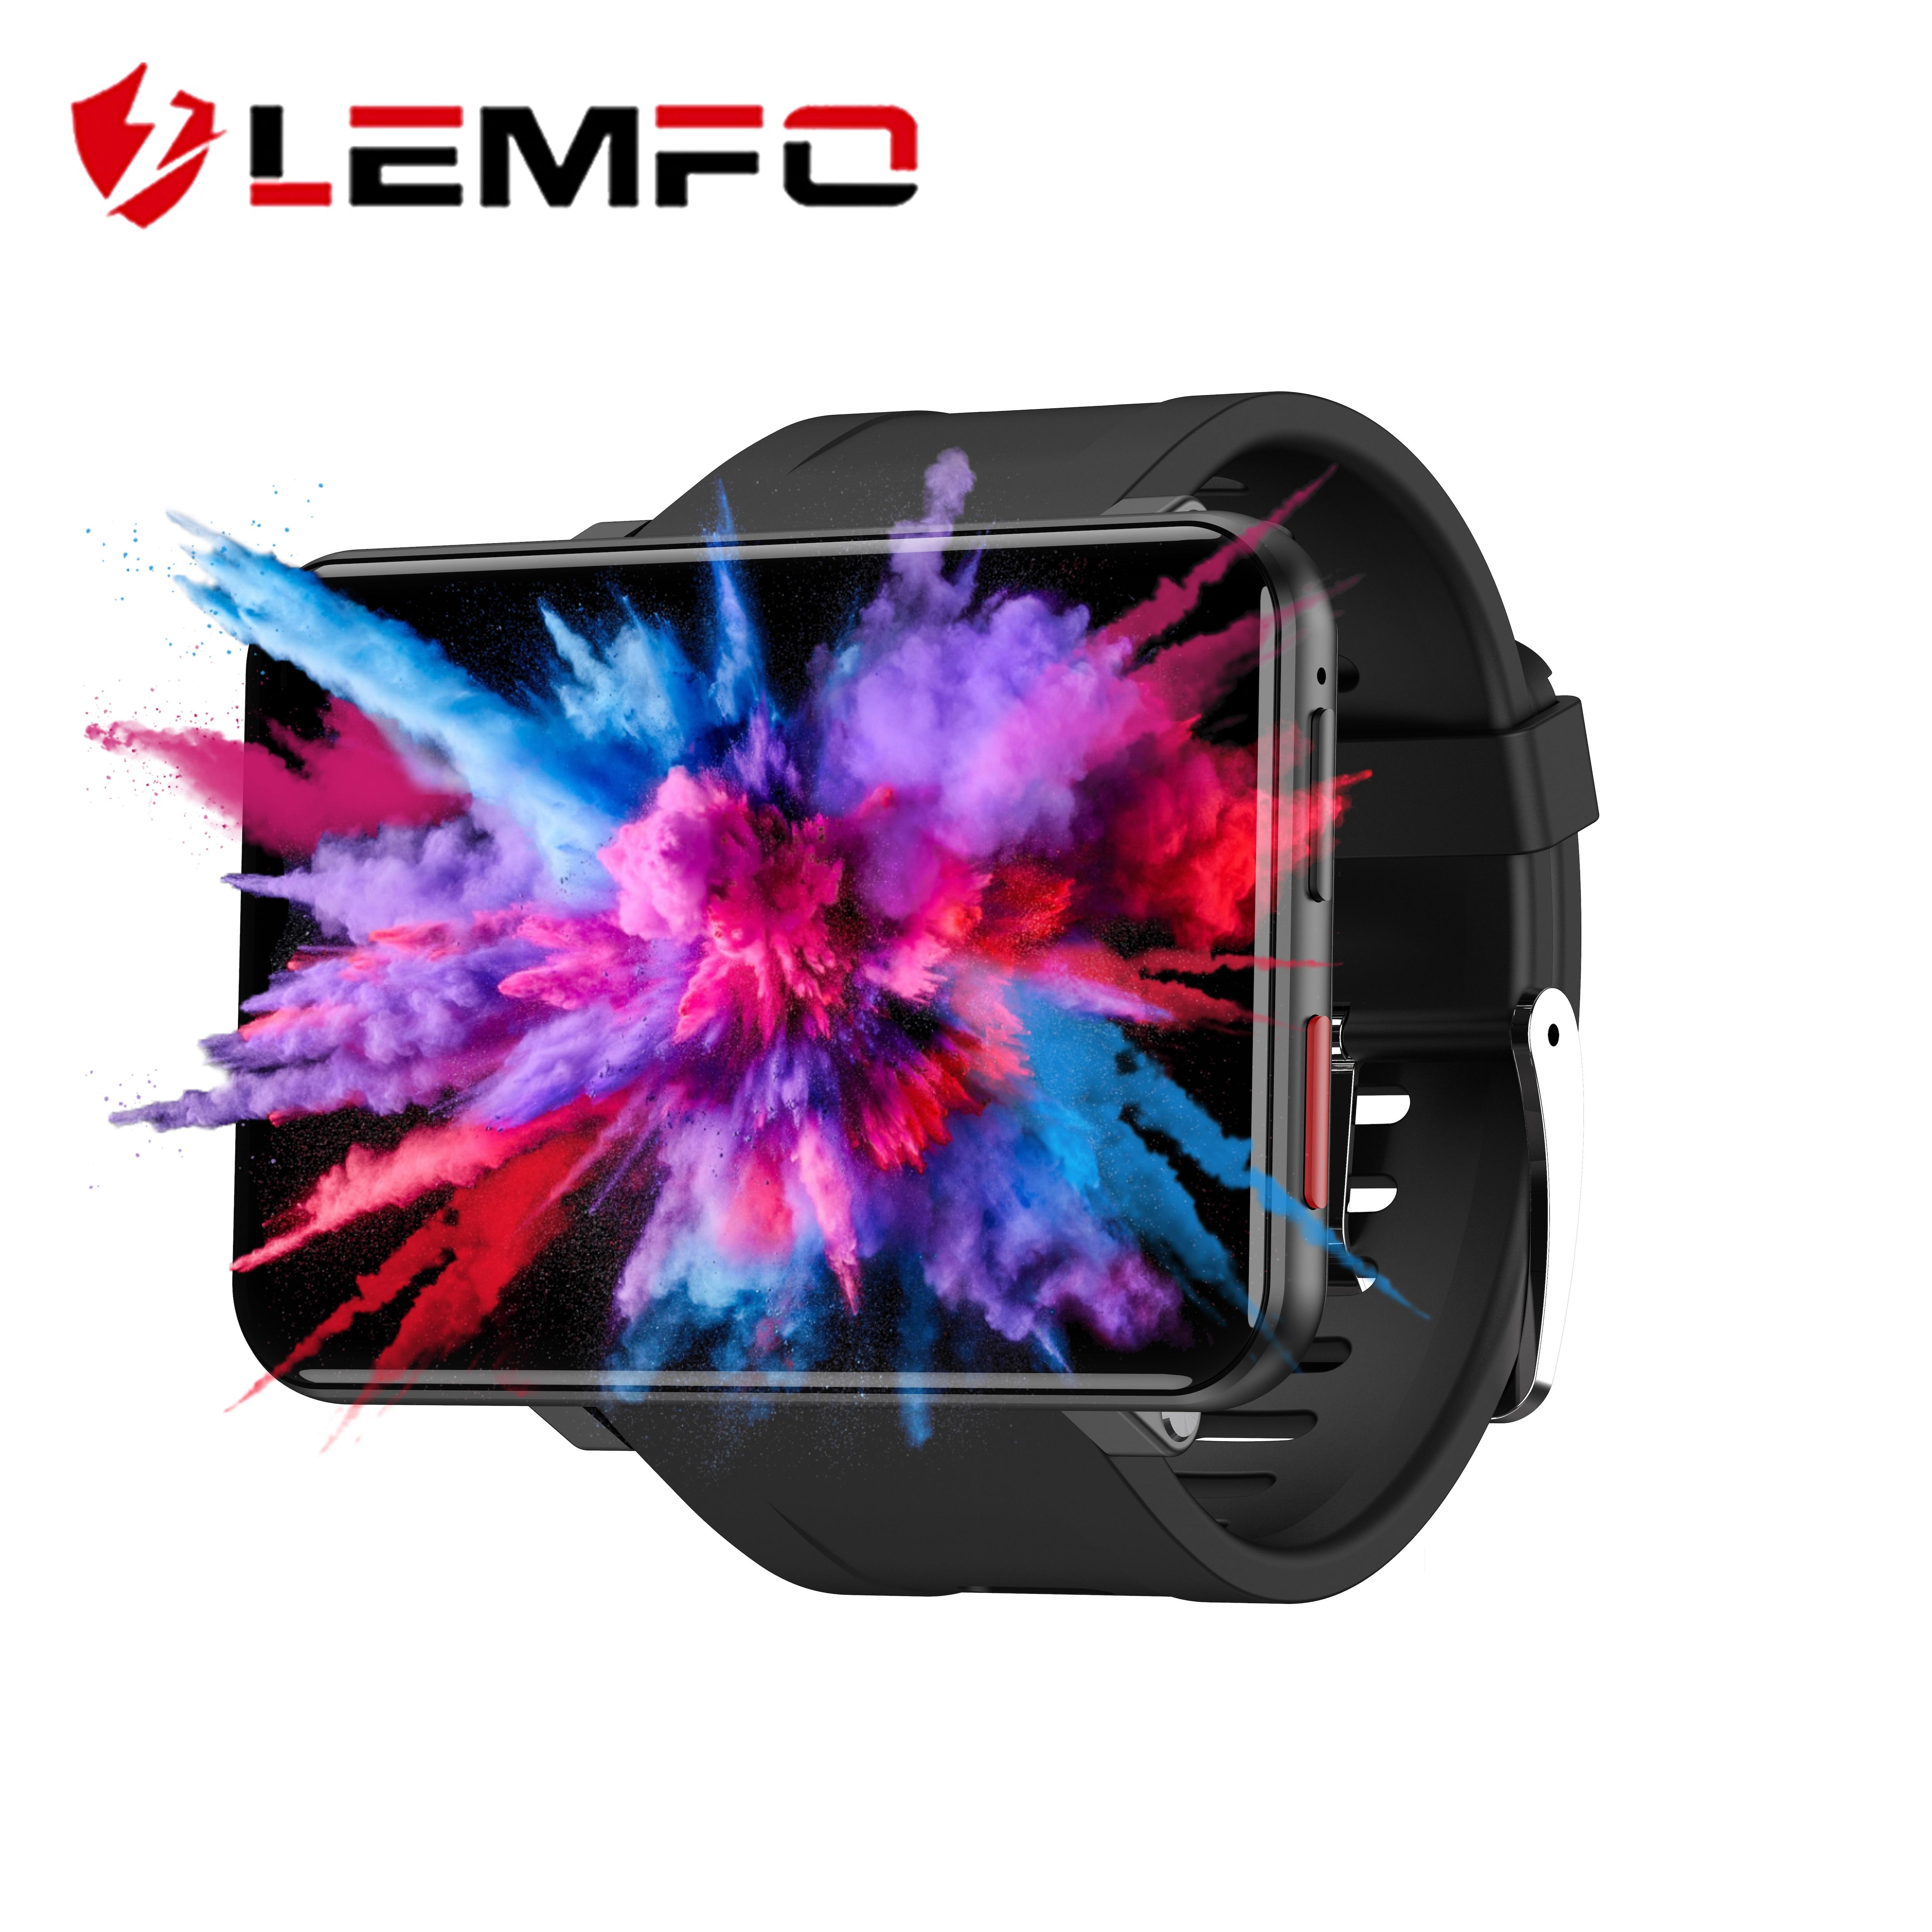 Get LEMFO LEMT 4G Smart Watch 2.86 inch Big Screen Android 7.1 3G RAM 32G ROM LTE 4G Sim Camera GPS WIFI Heart Rate 2700mAH Battery